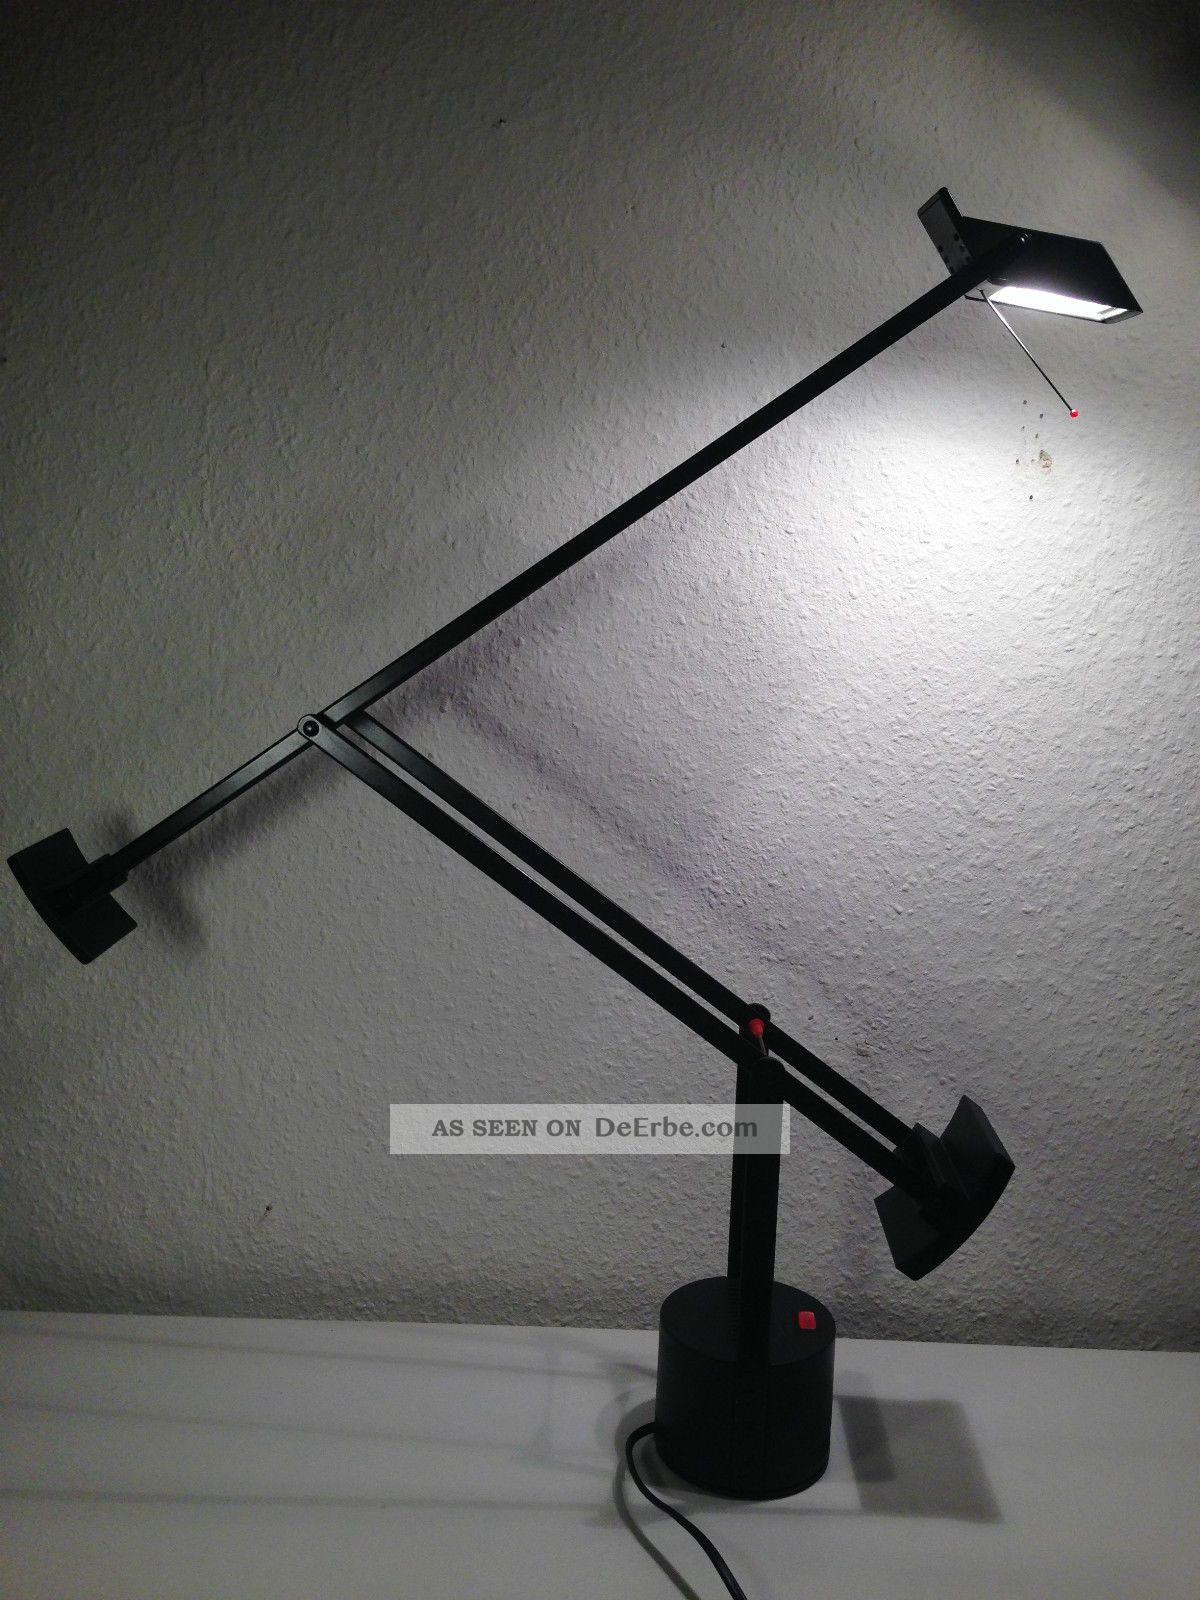 70er design tischlampe artemide tizio richard sapper schreibtischlampe. Black Bedroom Furniture Sets. Home Design Ideas